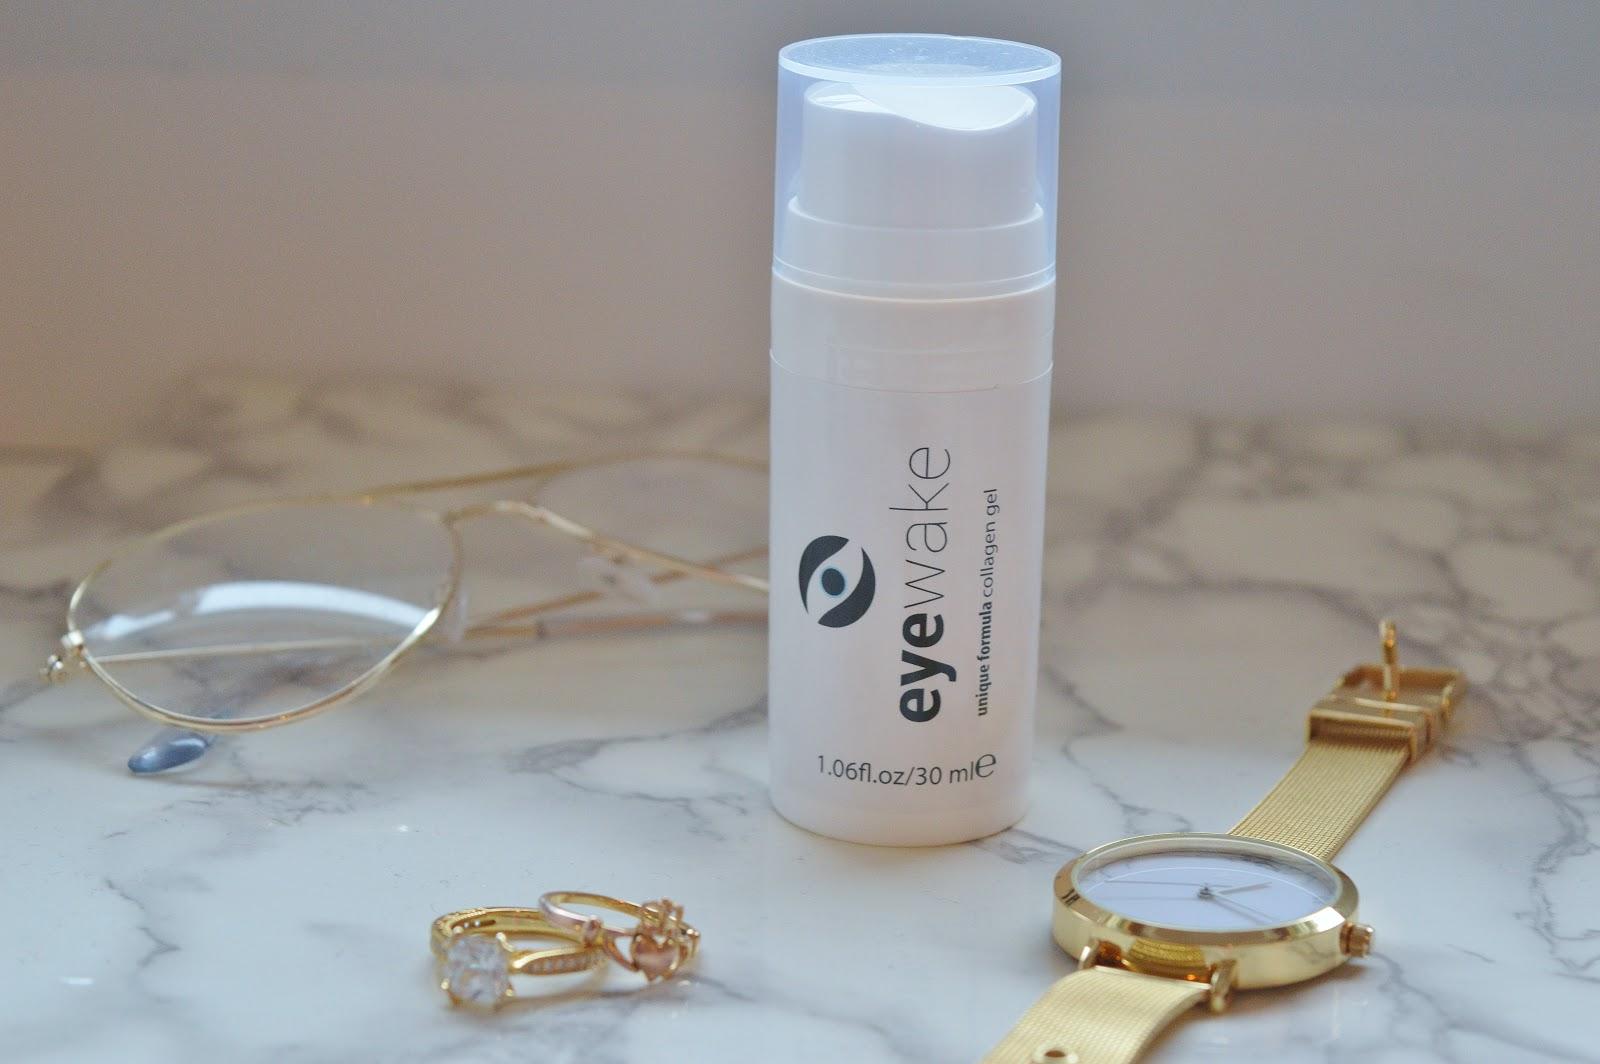 Eye Wake Collagen Gel Review